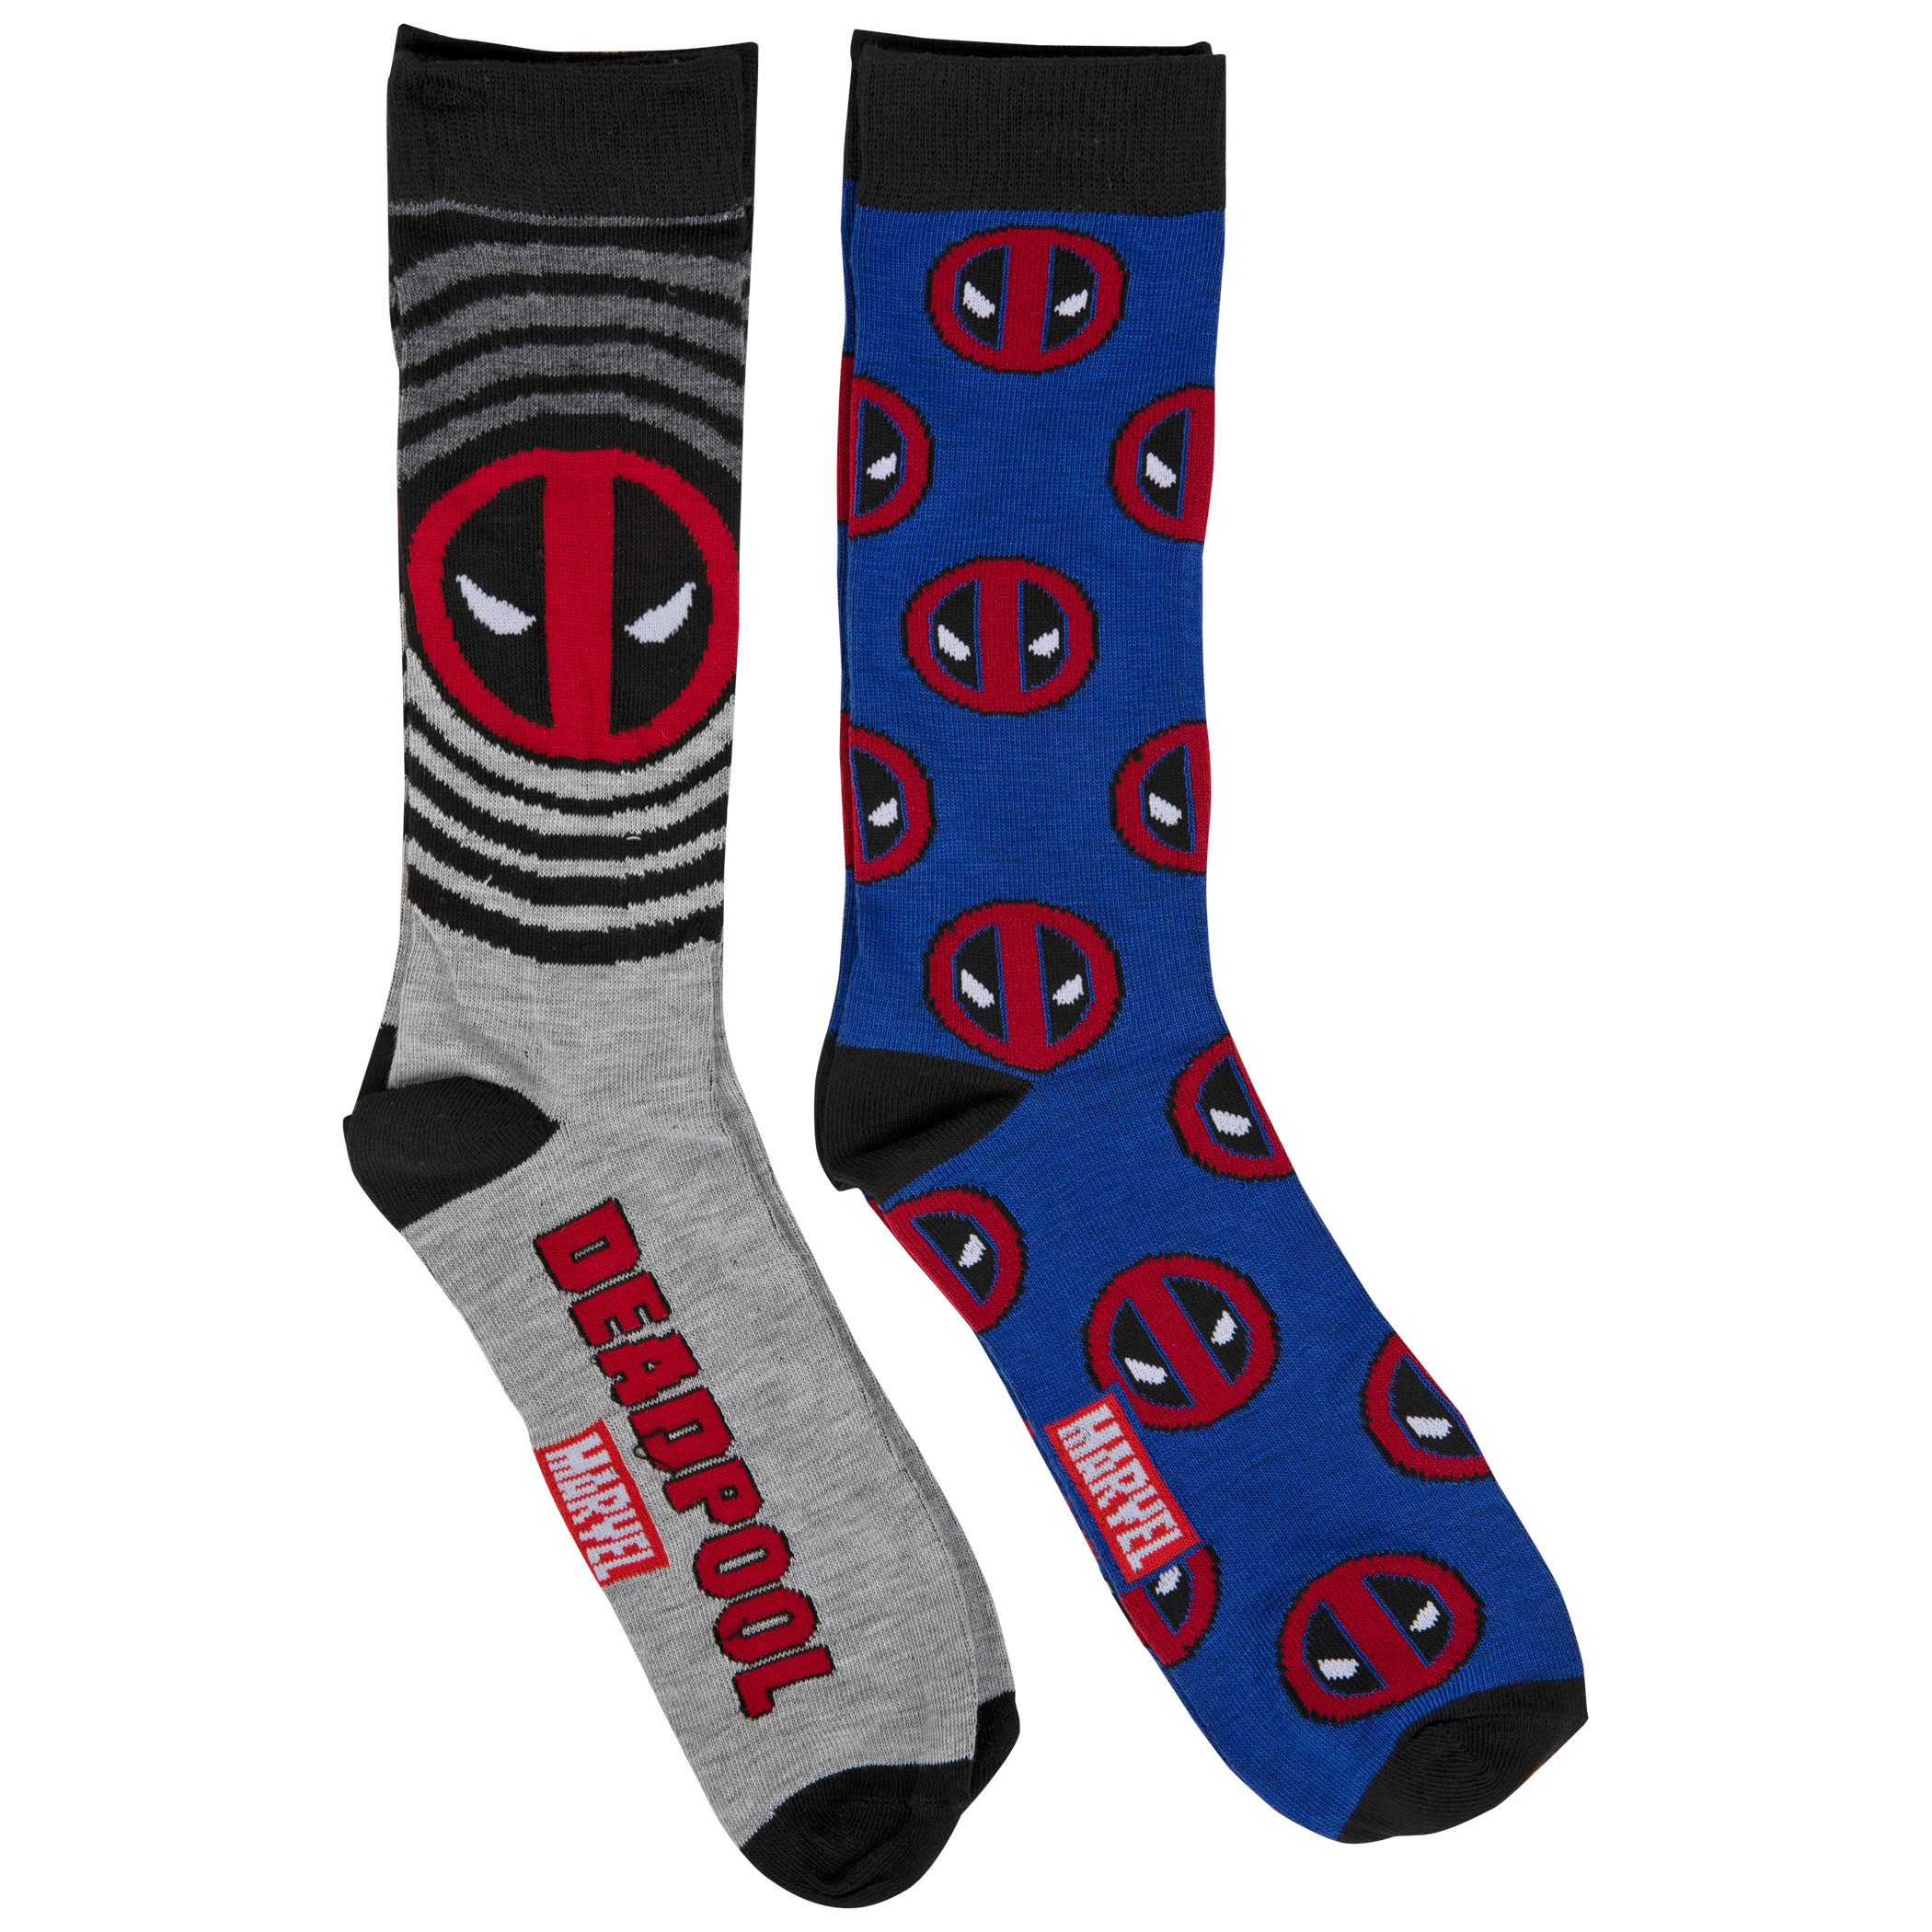 Deadpool Logos 2-Pair Pack of Crew Socks